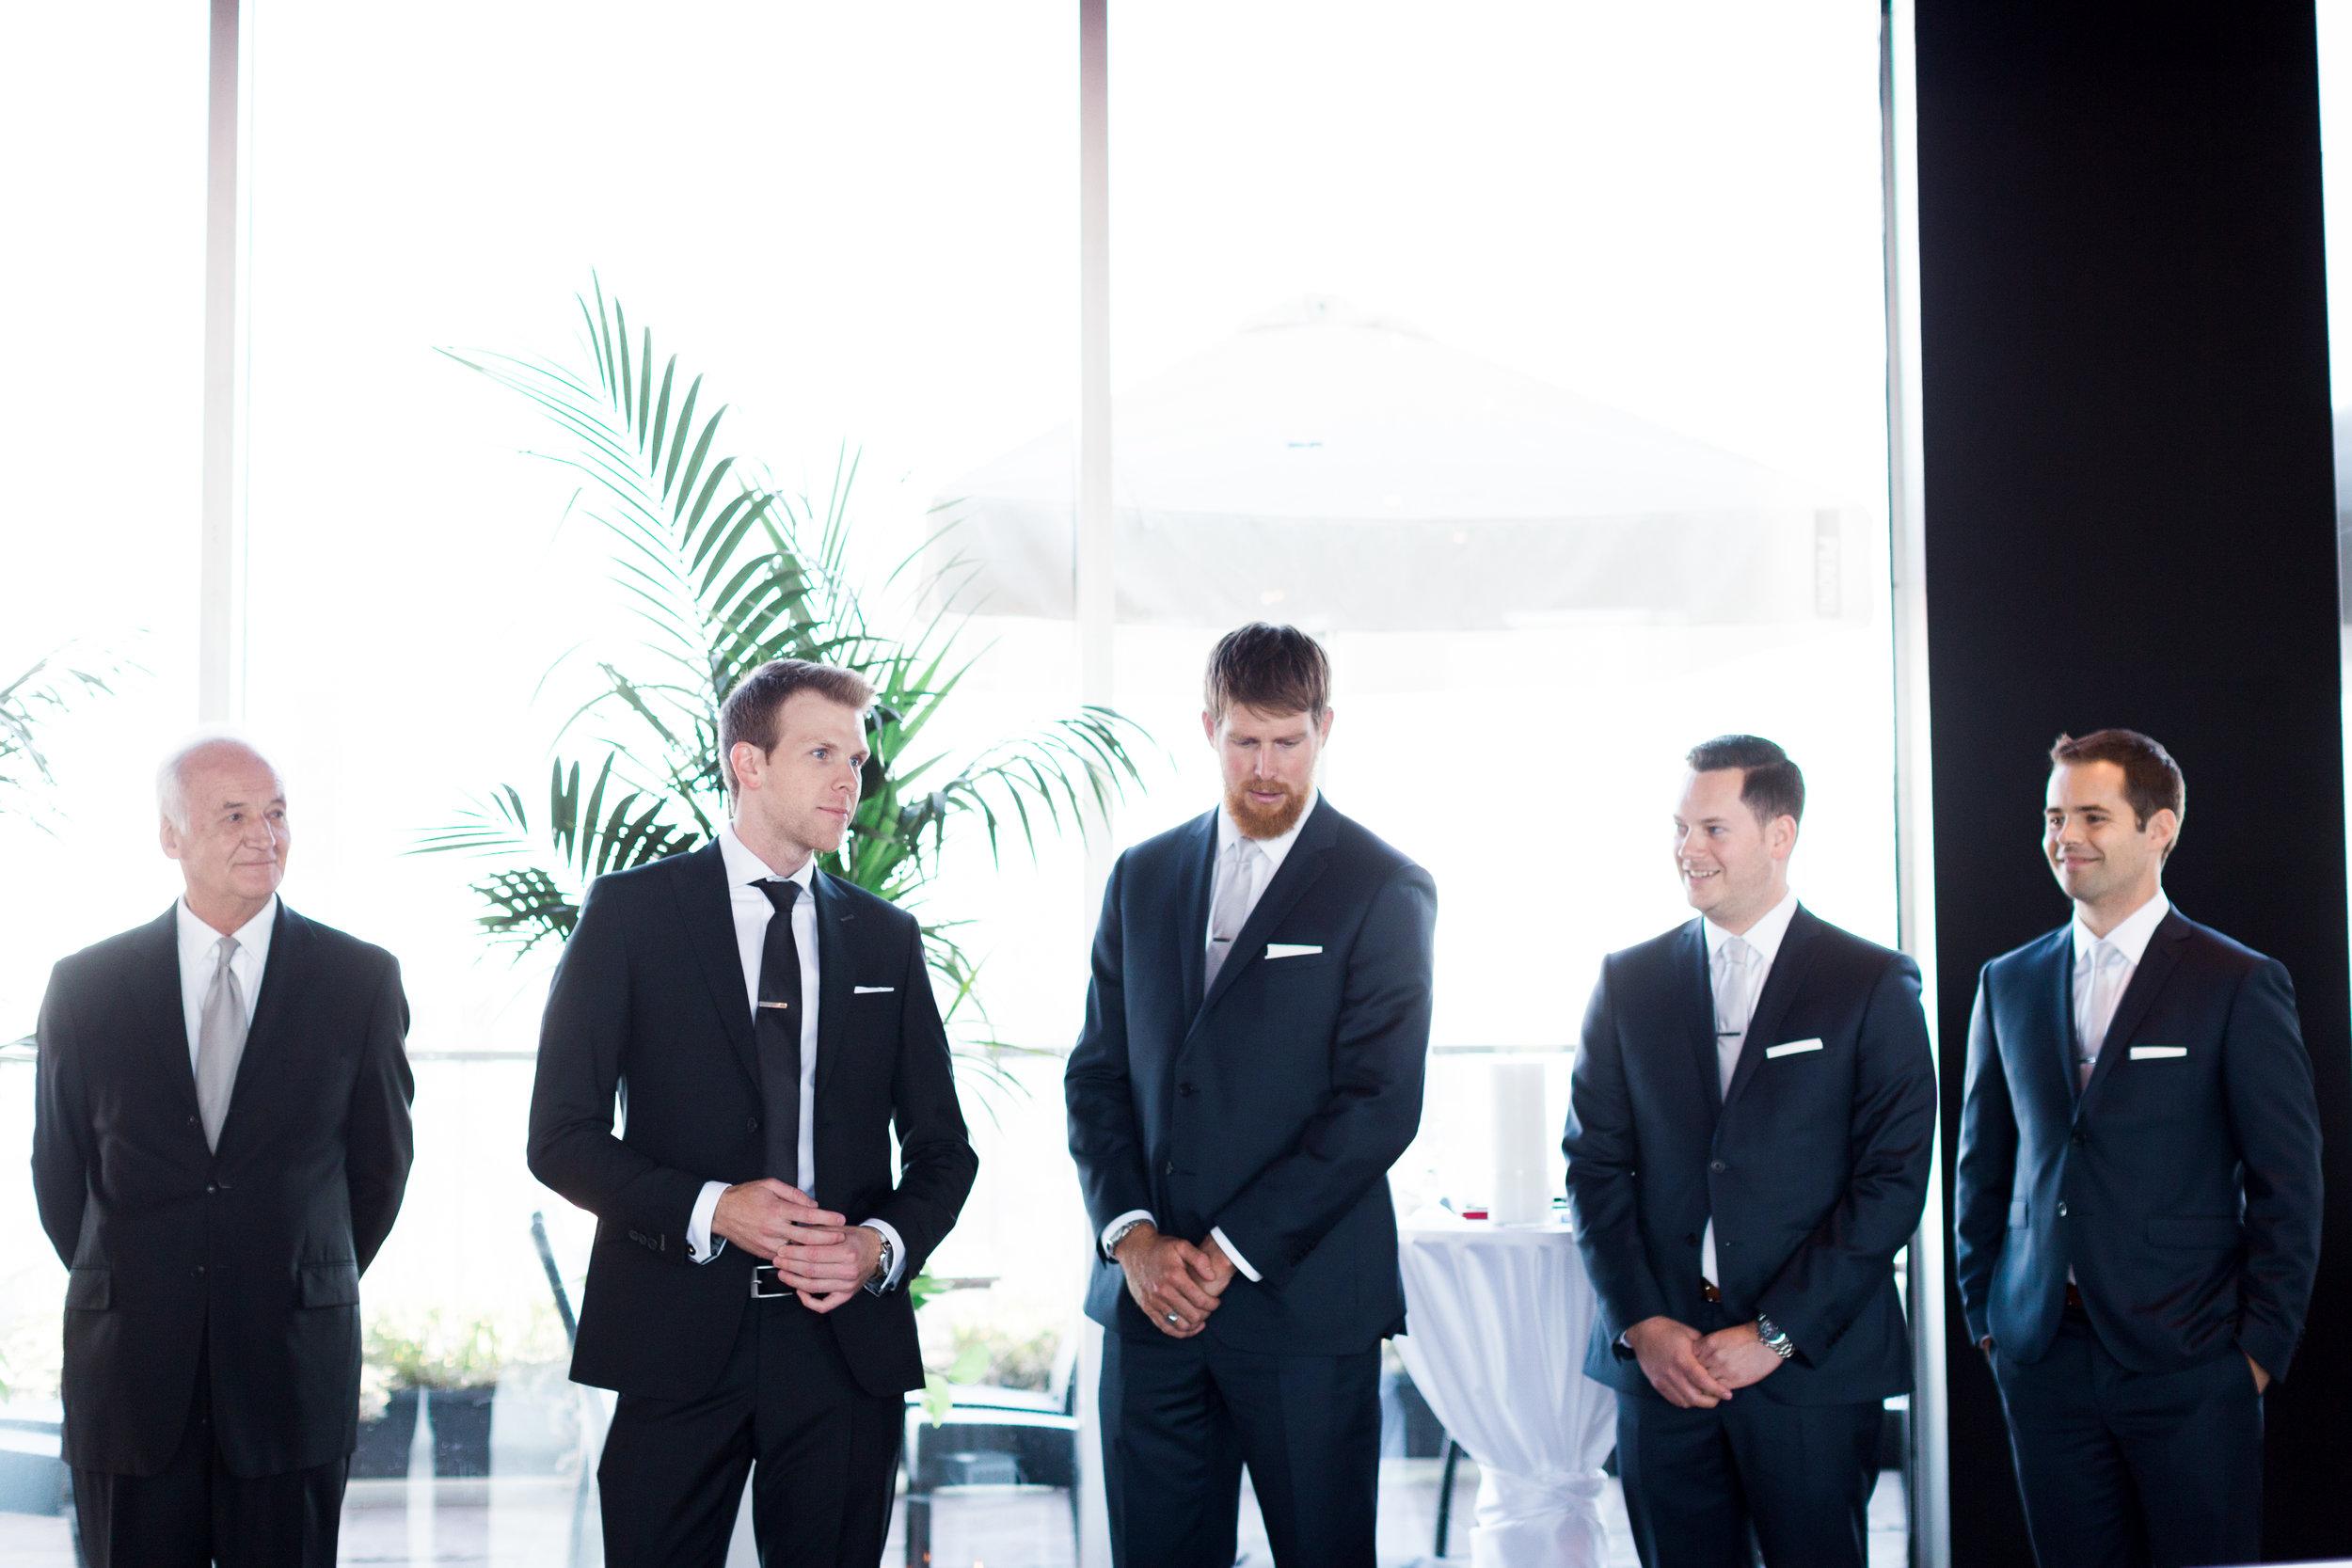 Toronto Fine Art Photographer - 180 Restaurant Wedding - Ceremony-26.jpg